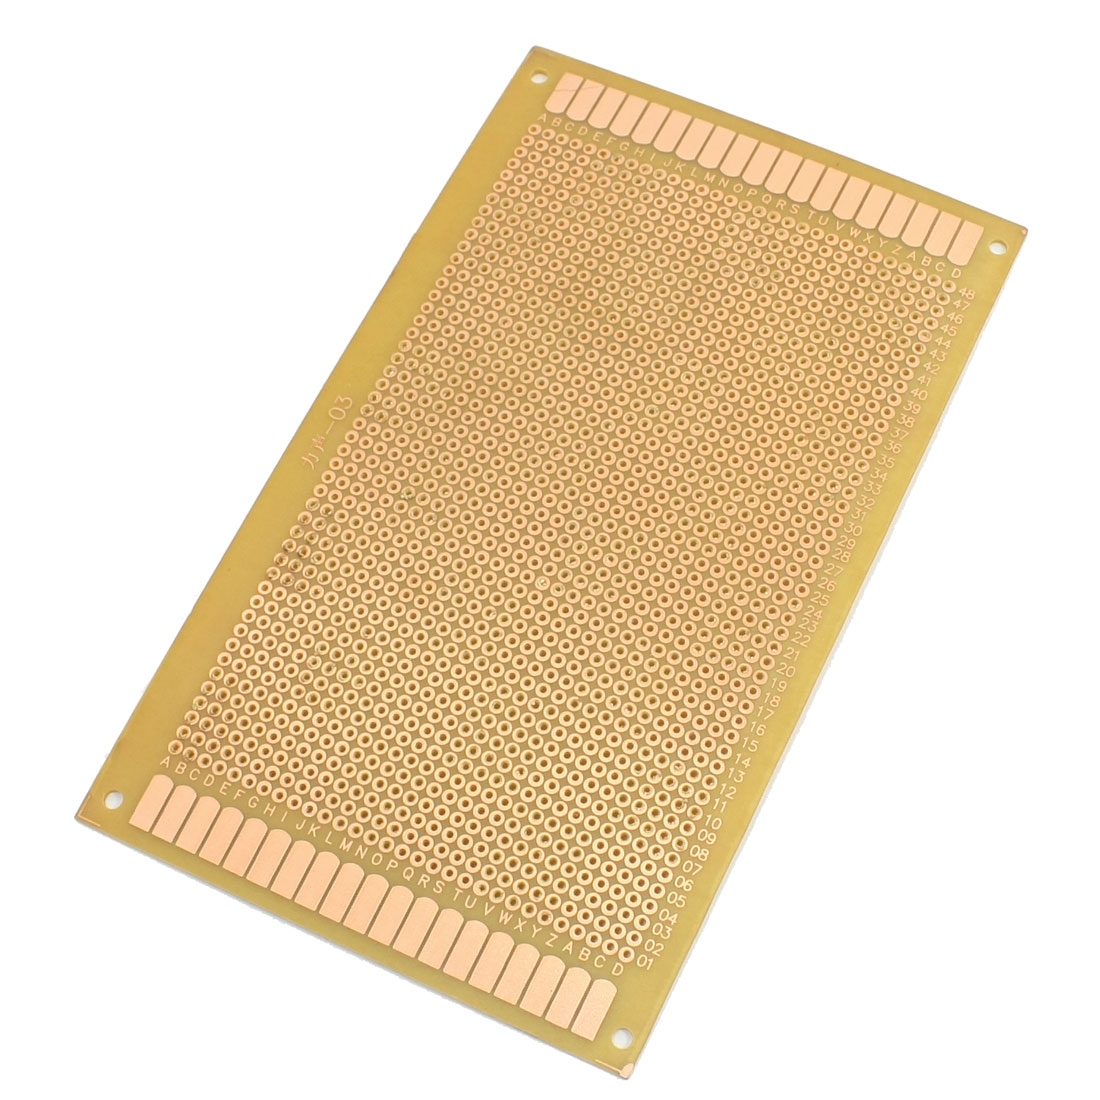 Electrical Prototyping Single Side Universal PCB Breadboard Stripboard 9cmx15cm